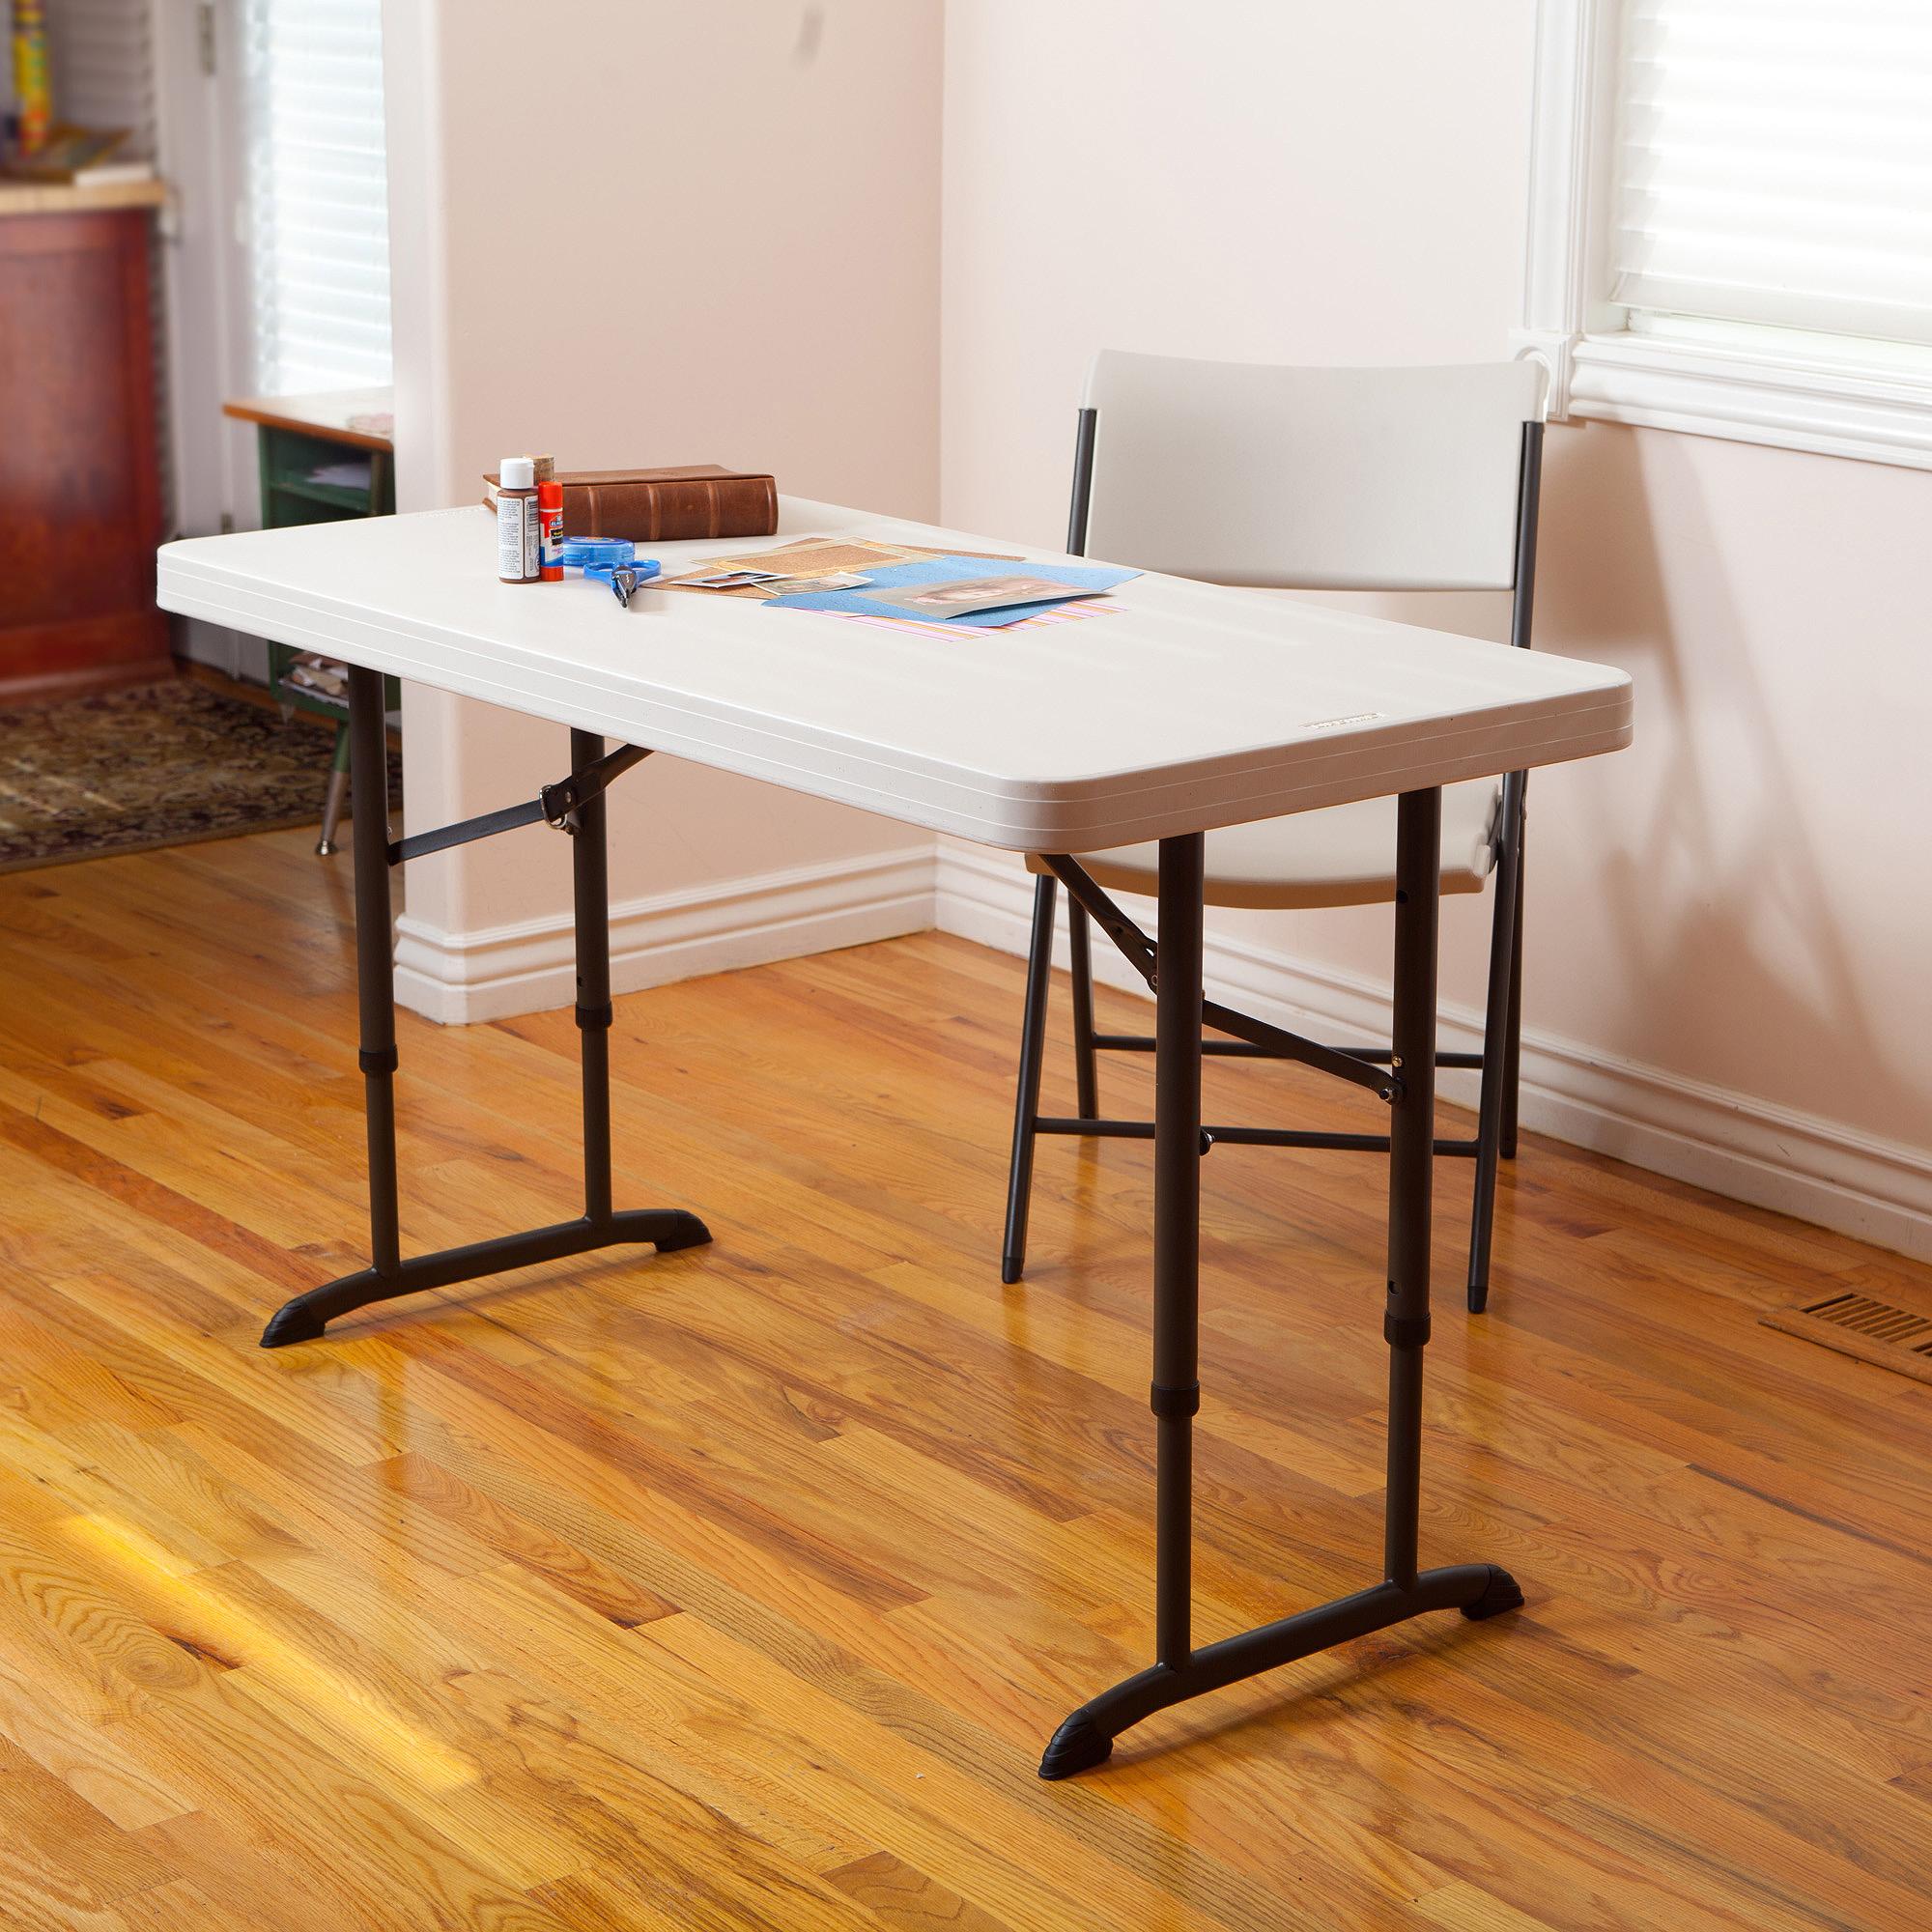 Lifetime 4' Adjustable Folding Table, White Granite